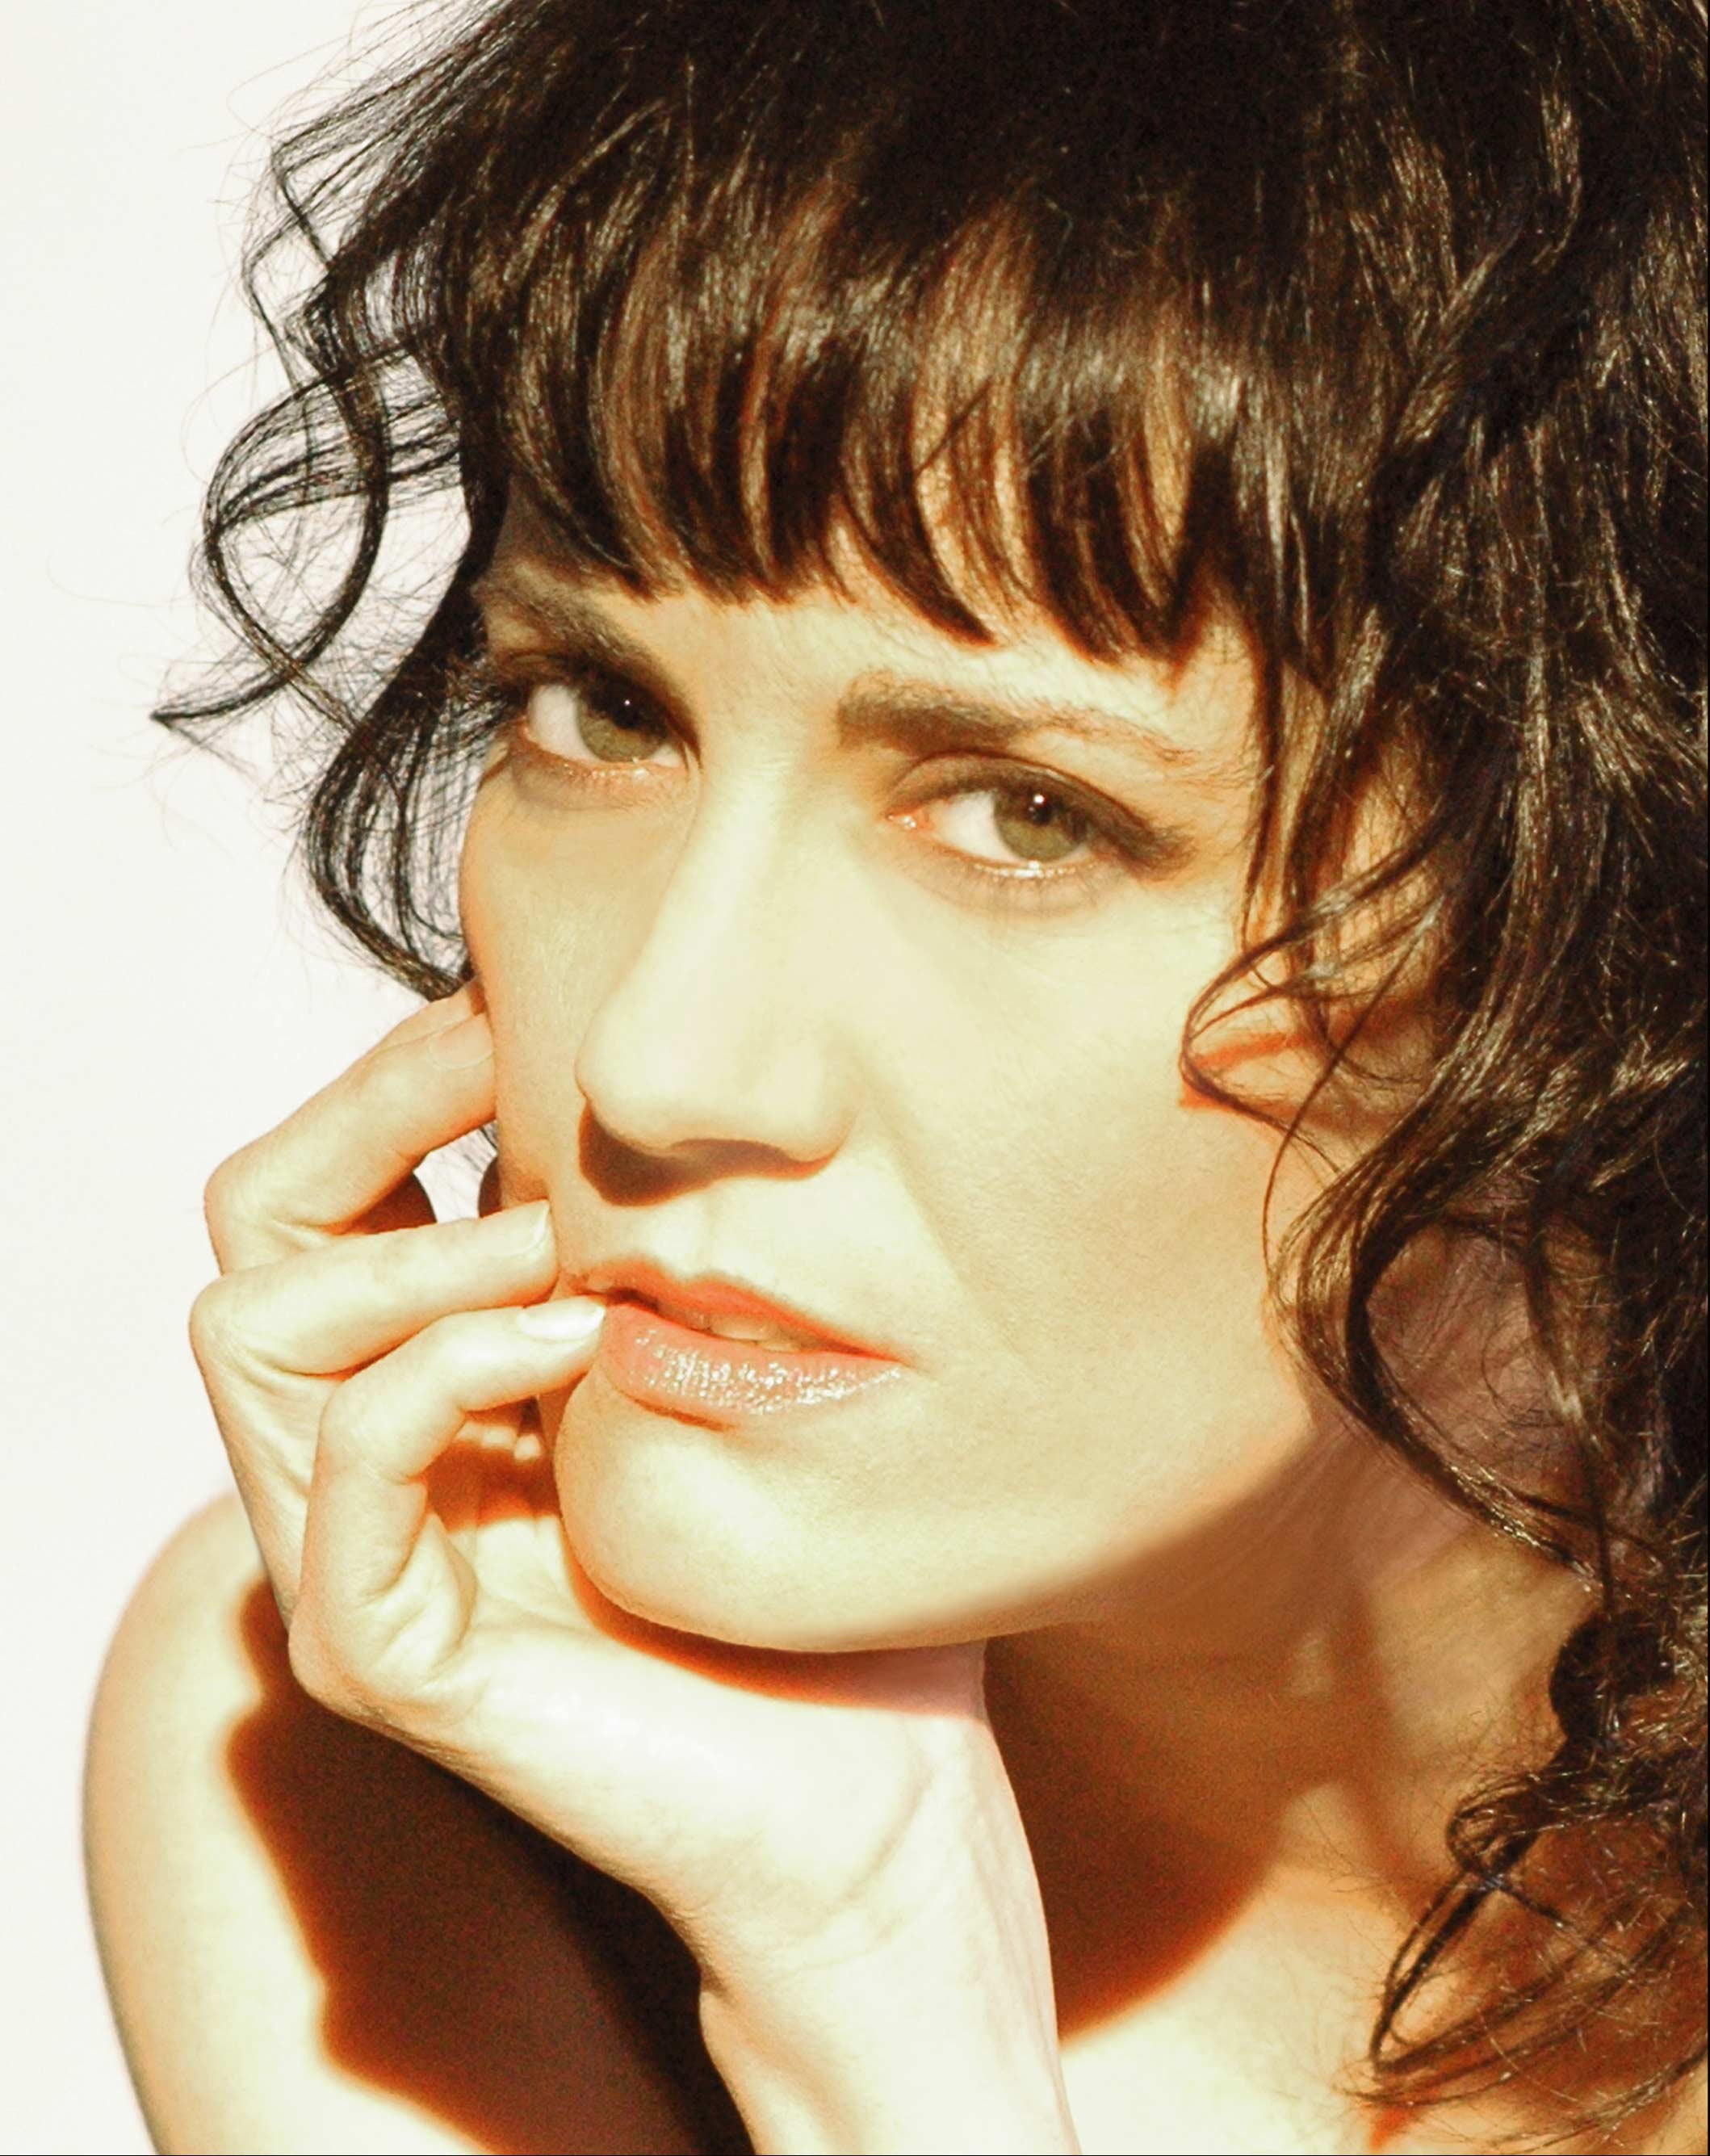 Coralina Cataldi-Tassoni photo Gloria Fegiz